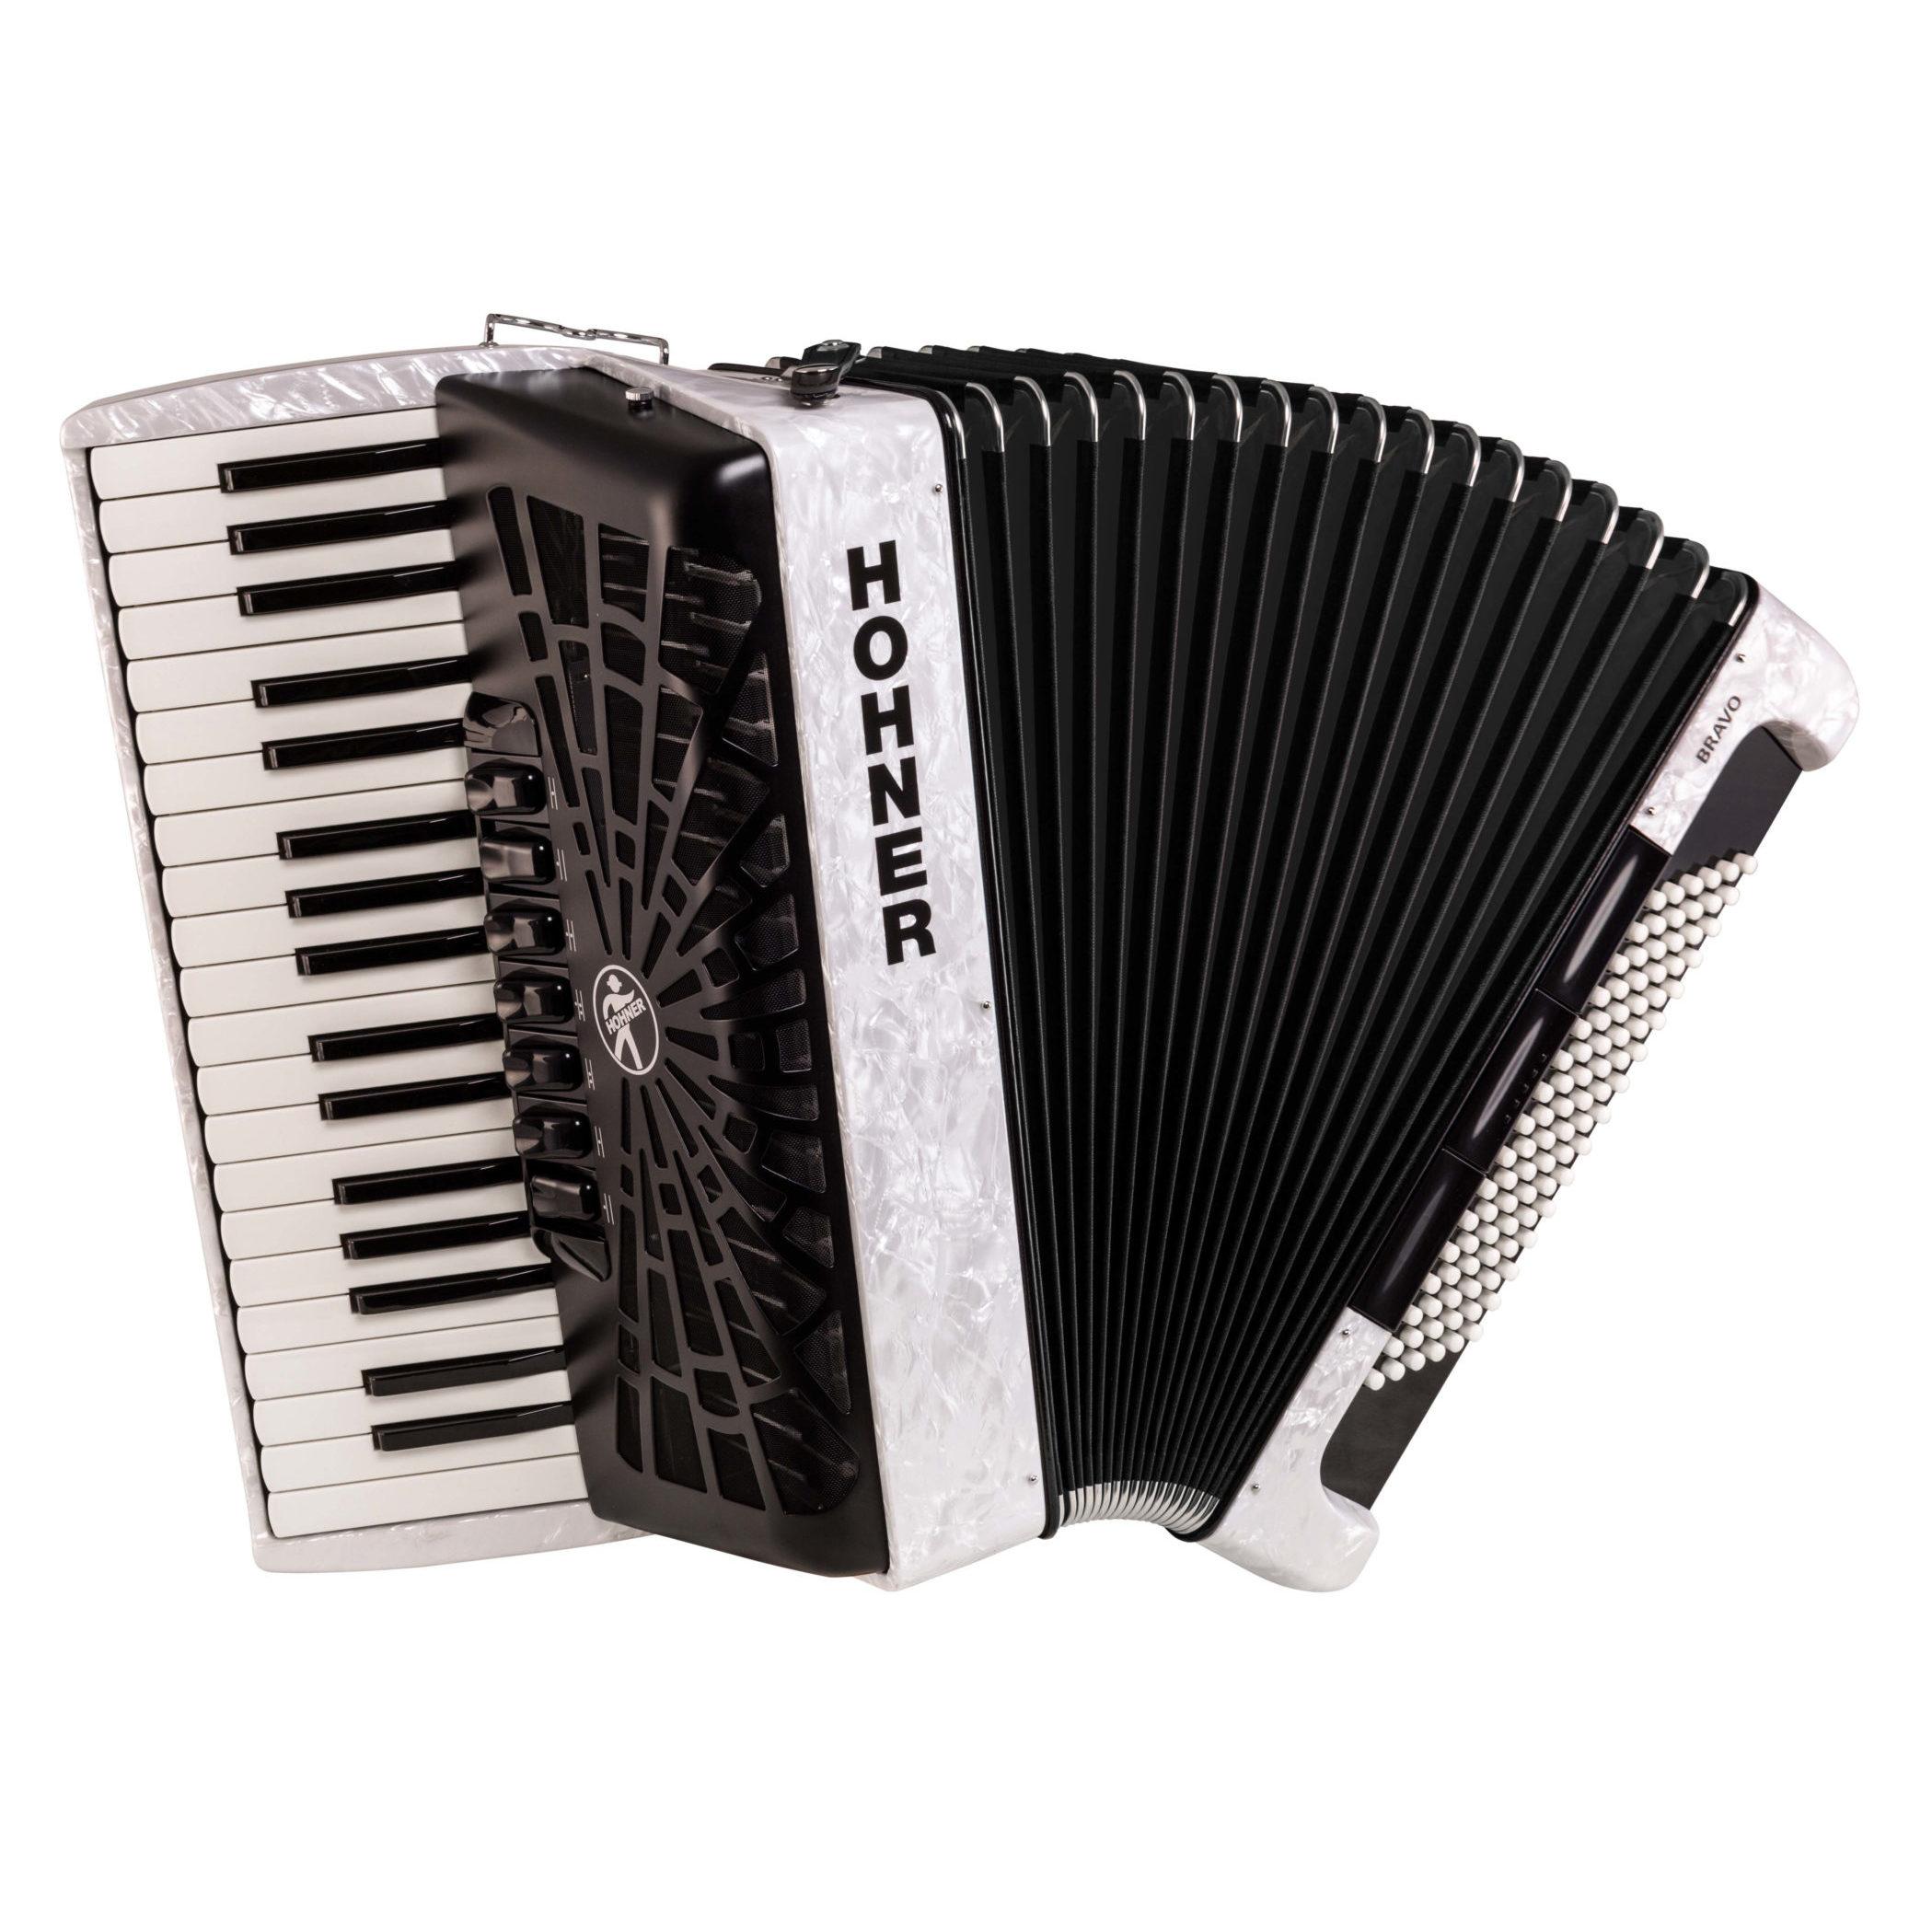 Hohner Bravo III 96, pearl white w. black bellows